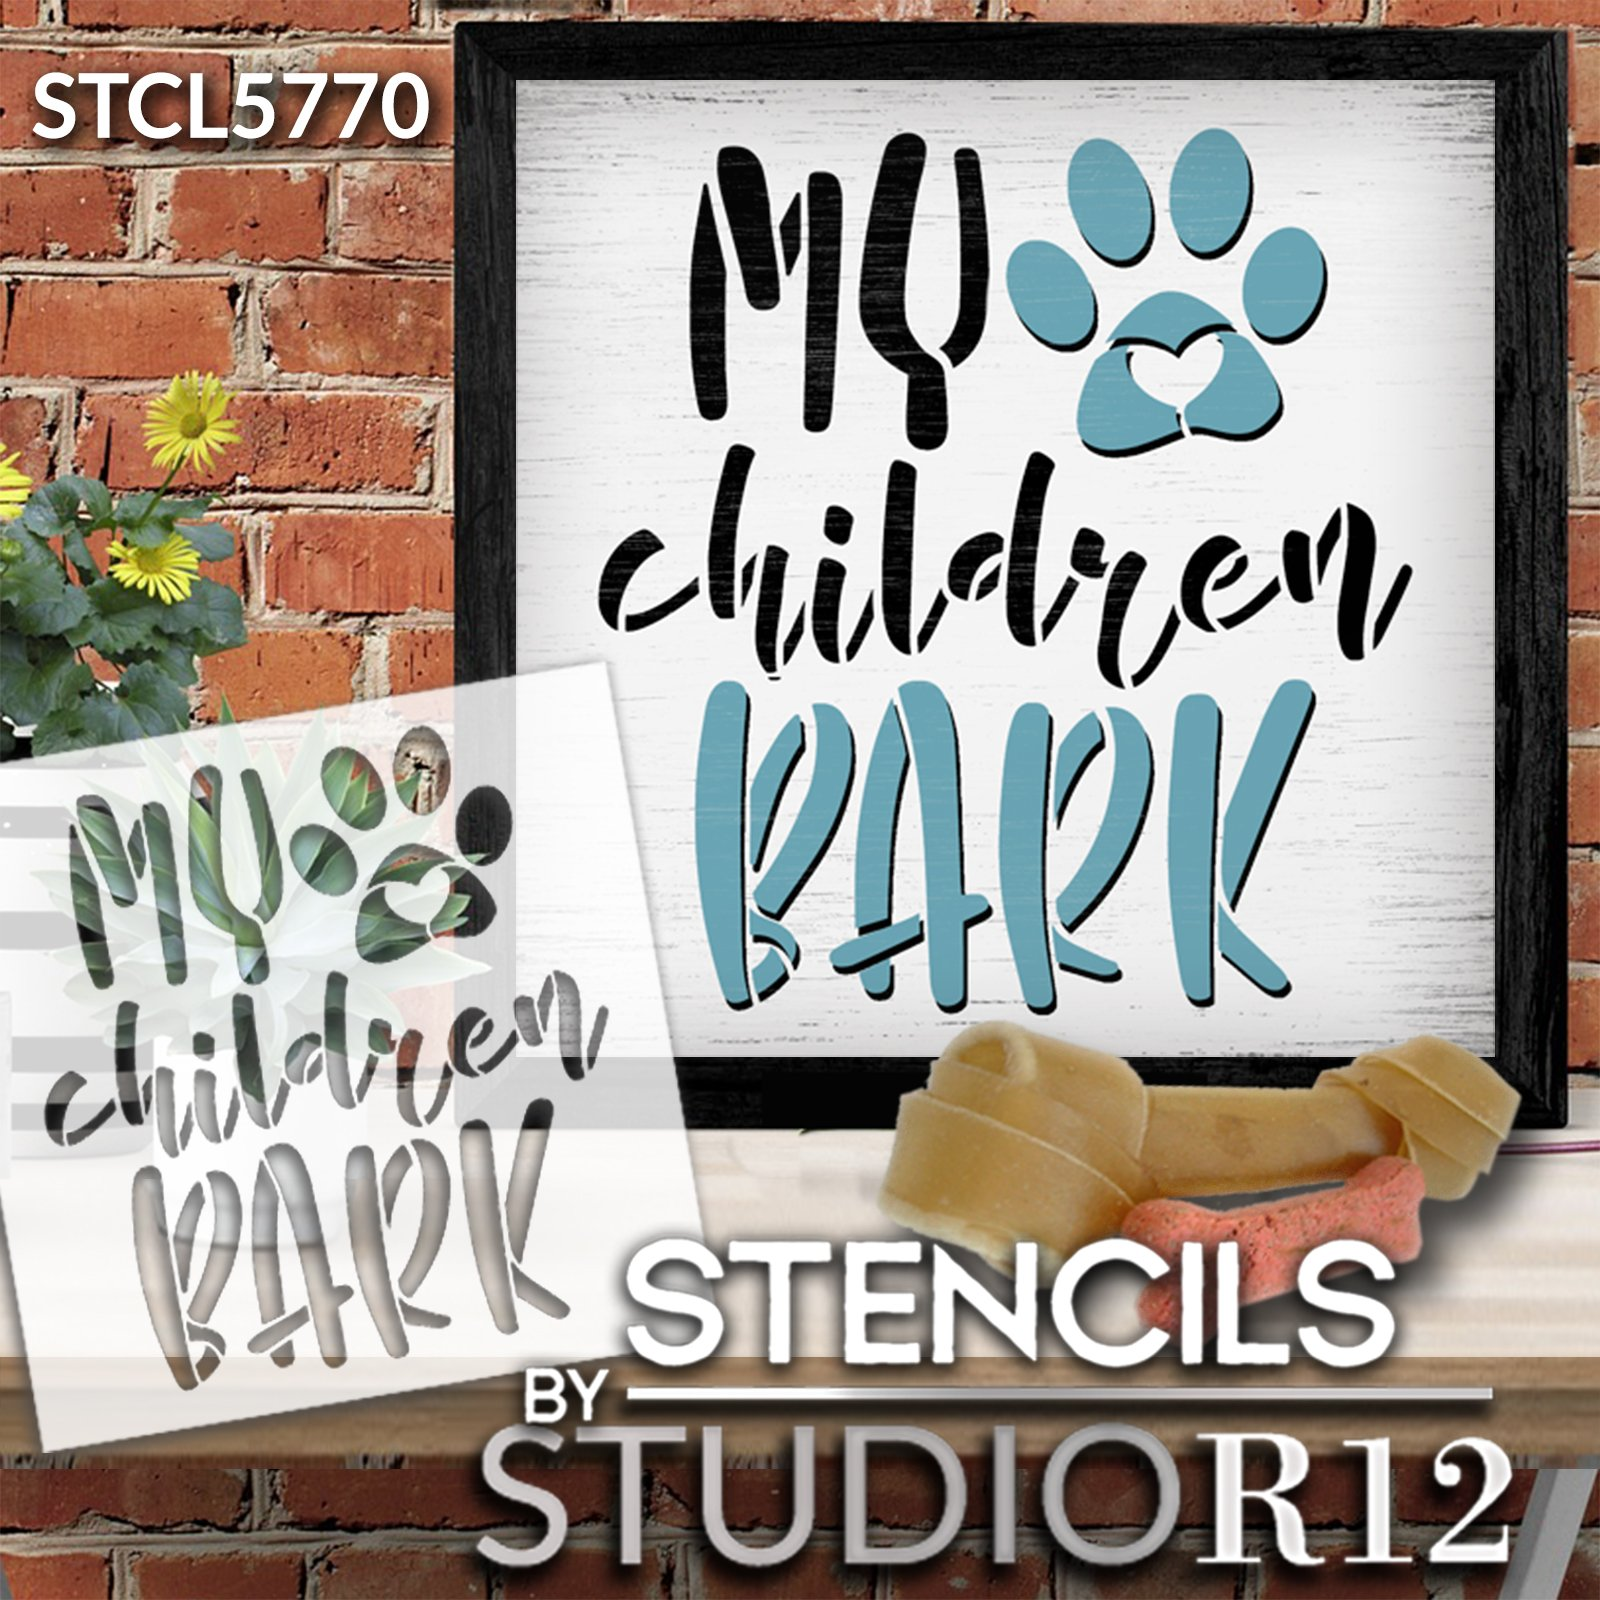 My Children Bark Stencil by StudioR12   Craft DIY Dog Pawprint Home Decor   Paint Pet Parent Wood Sign   Reusable Mylar Template   Select Size